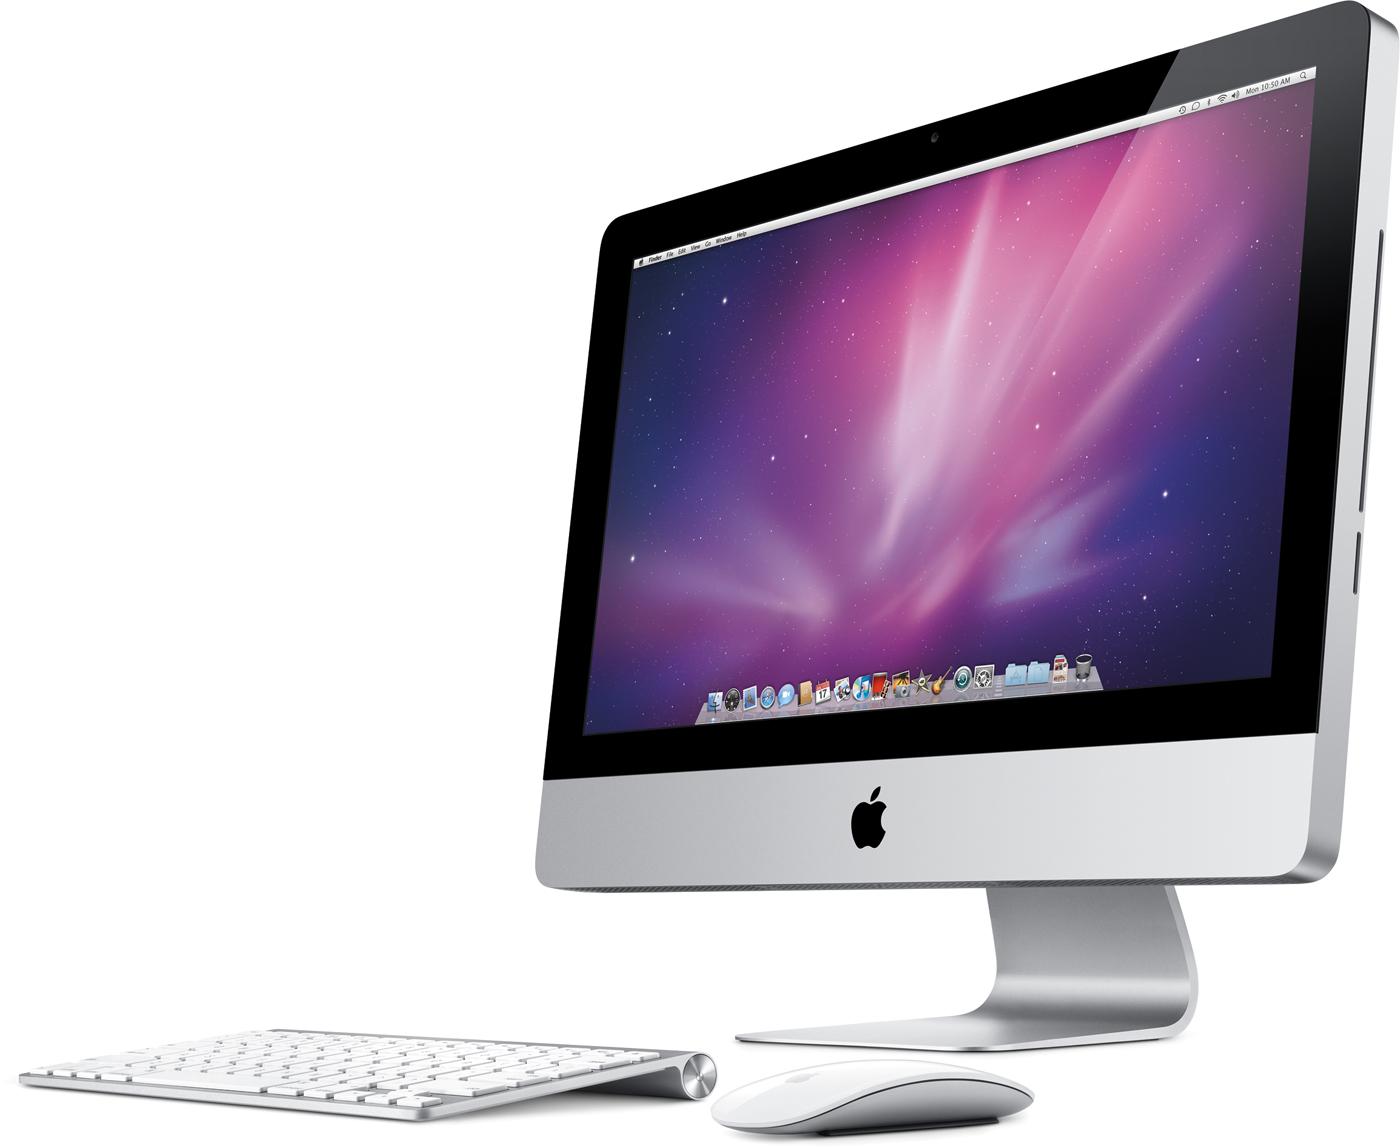 iMac de 21,5 polegadas visto de lado